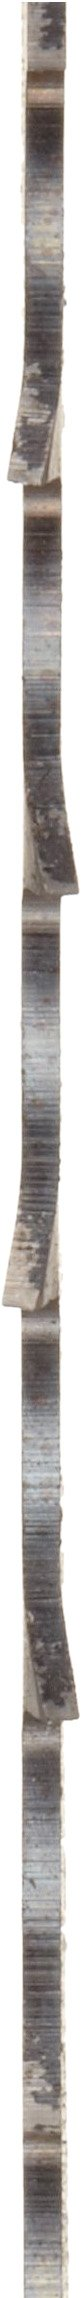 Starrett Duratec SFB Band Saw Blade, Carbon Steel, Hook Tooth, Raker Set, Positive Rake, 154 Length, 1/2 Width, 0.025 Thick, 4 TPI (Tamaño: 12' 10)